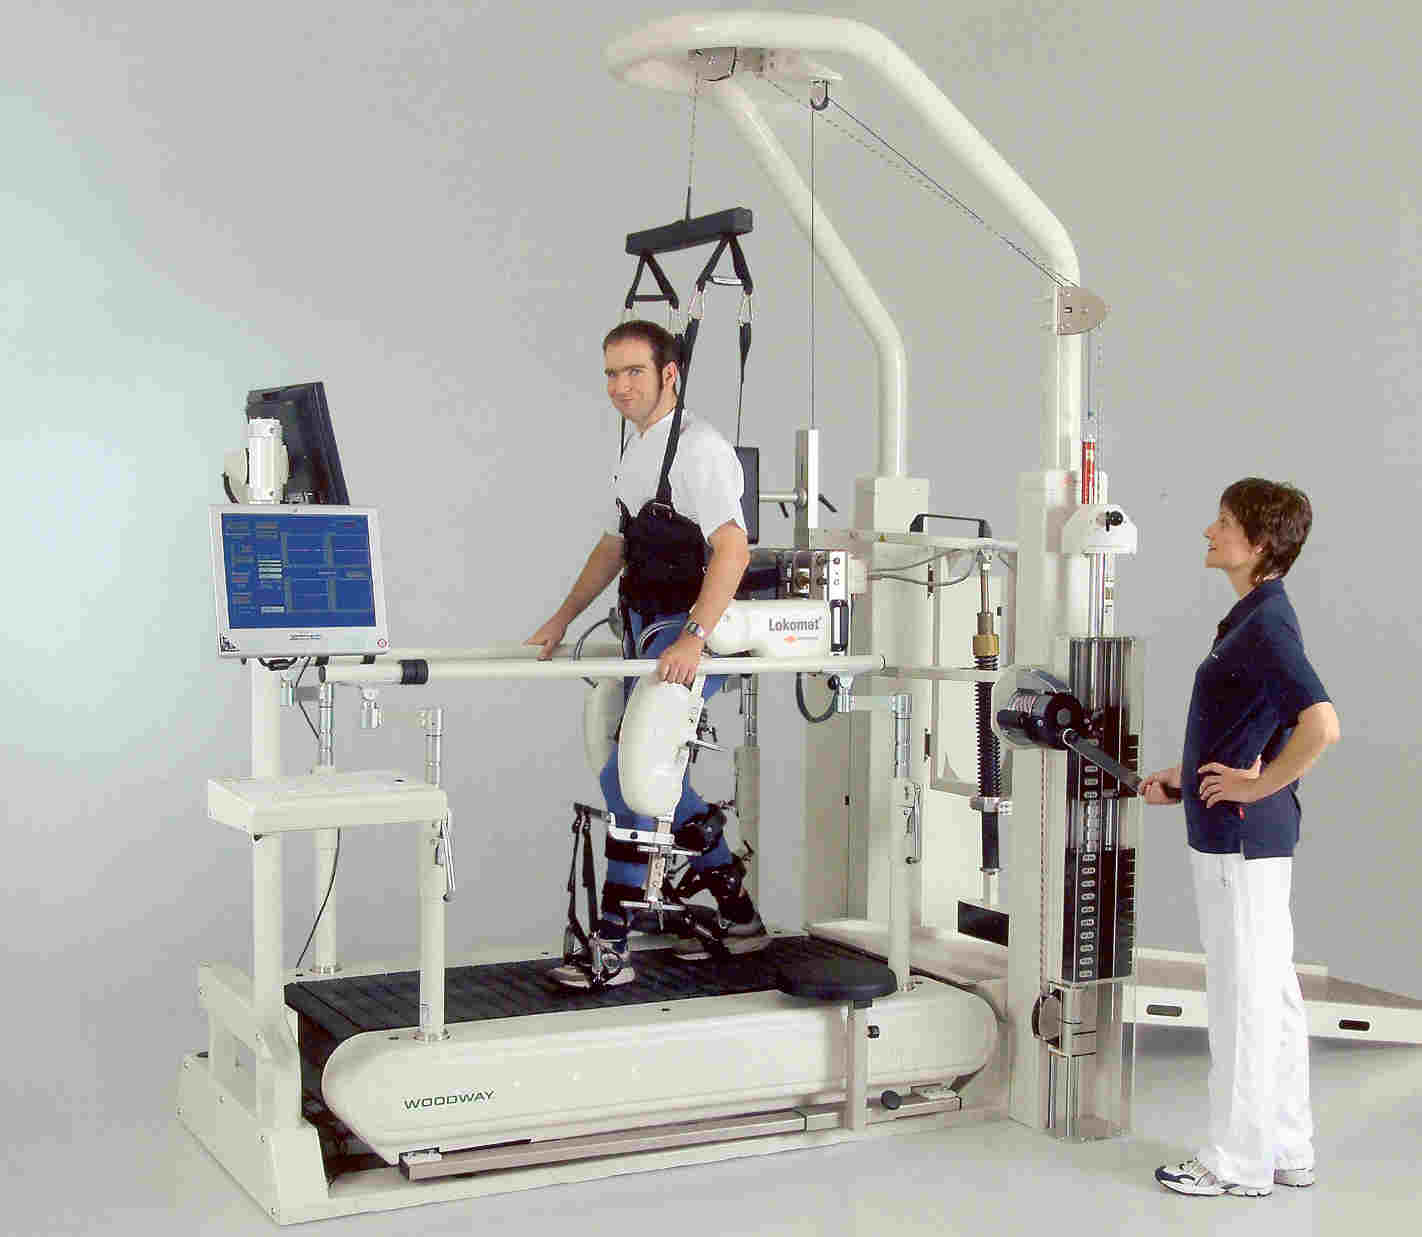 terapia rehabilitacion: